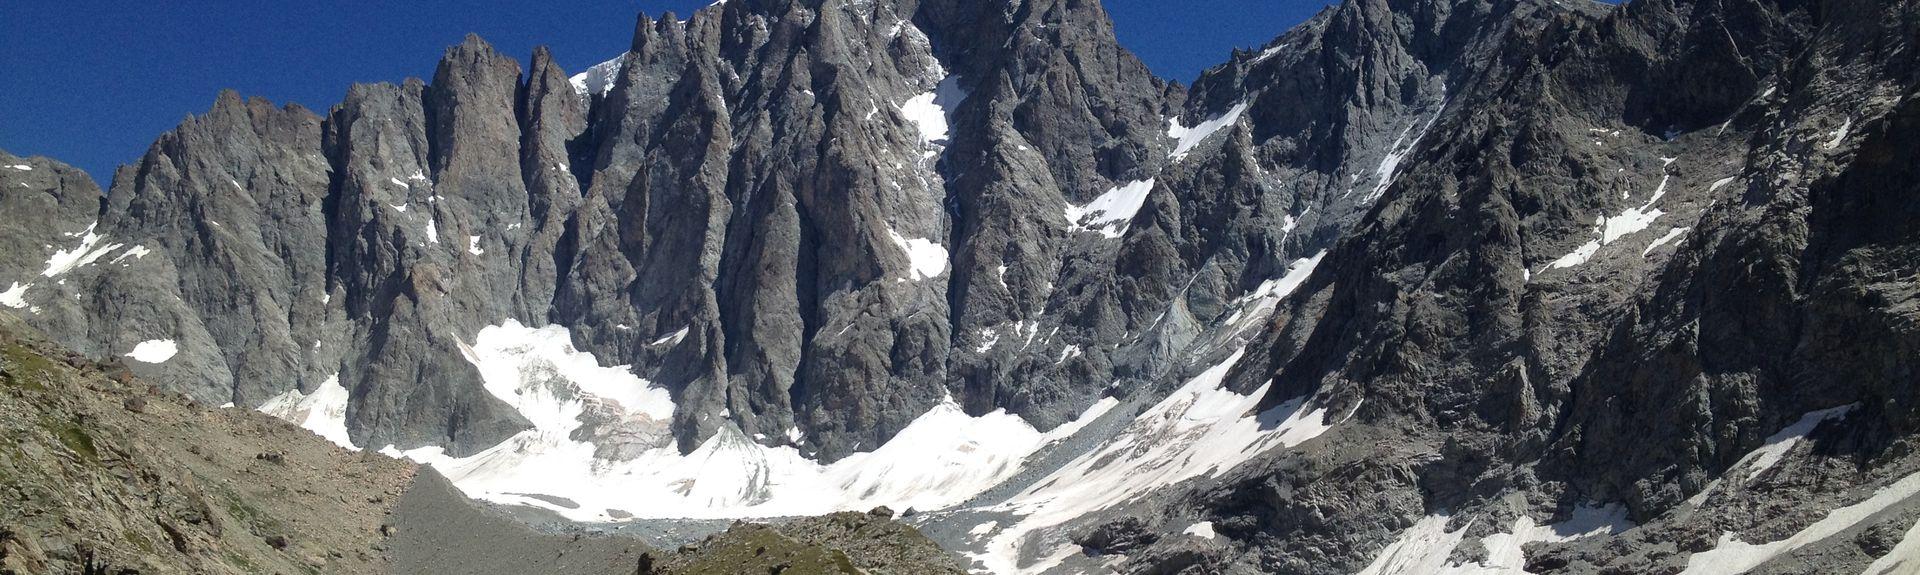 Venosc, Auvernia-Ródano-Alpes, Francia